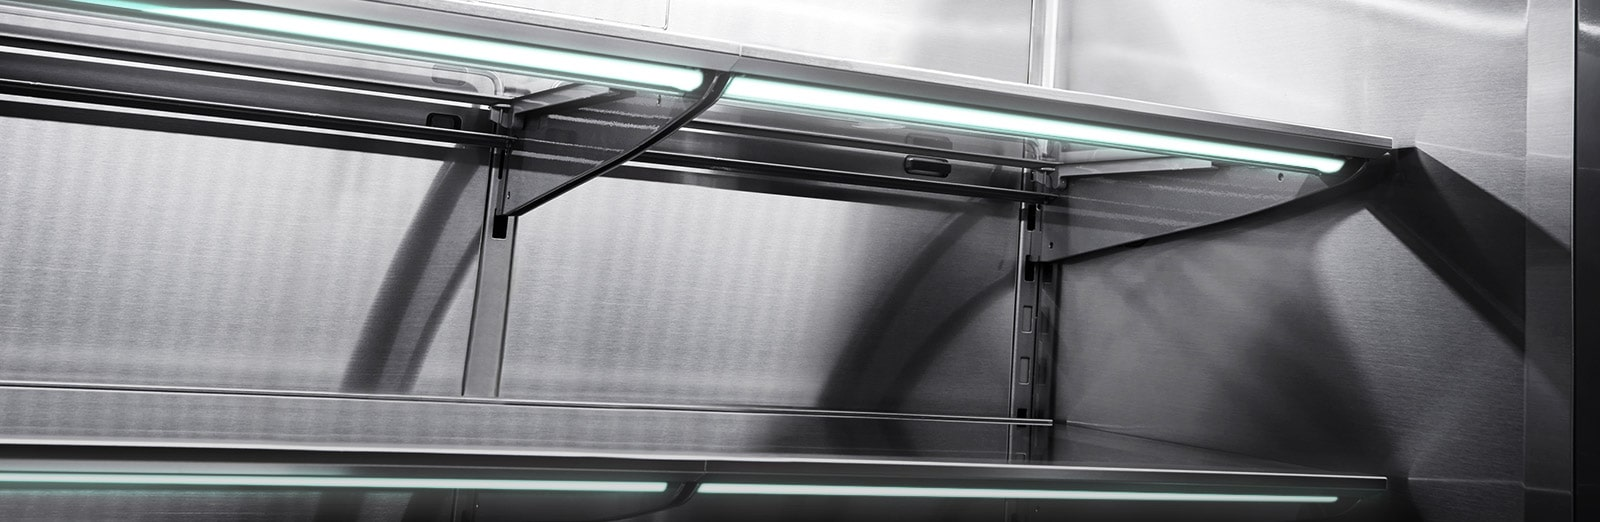 Refrigerator showcasing Premium LED lighting under each shelf